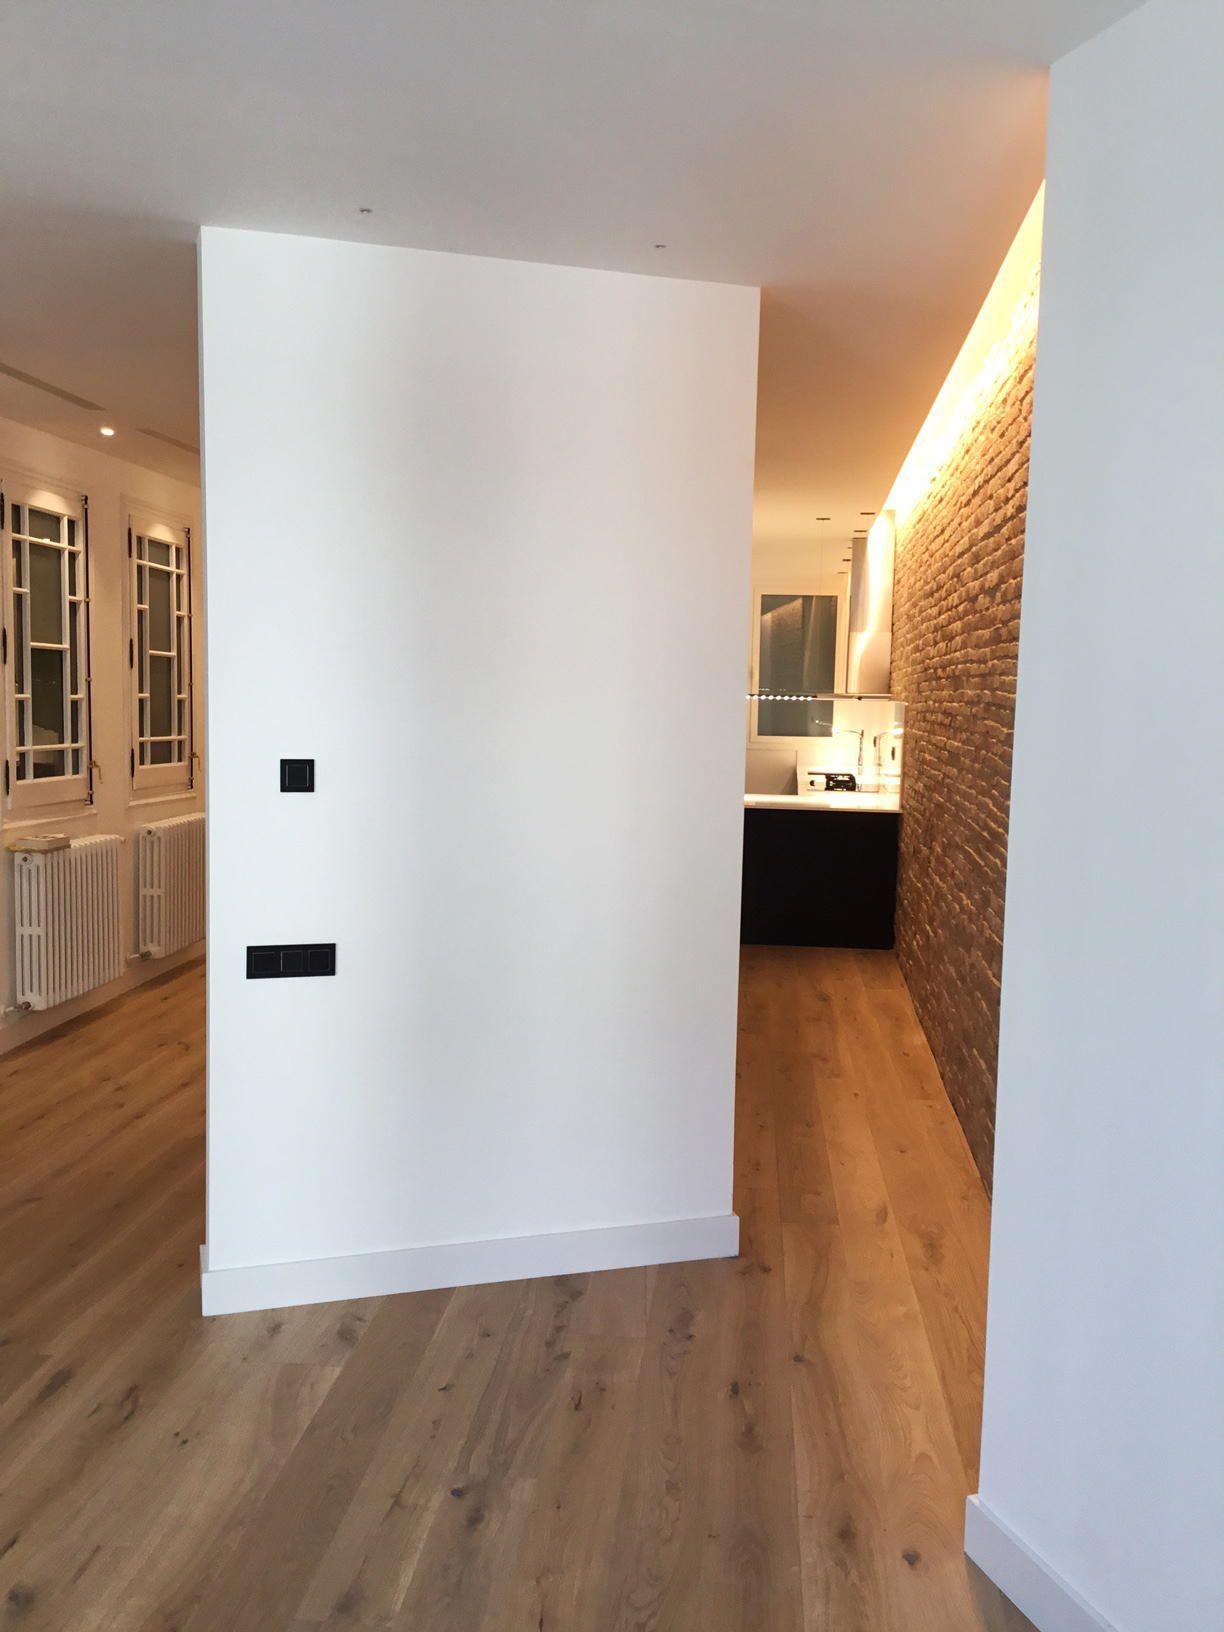 Proyecto de iluminación interior. Rehabilitación de vivienda en centro histórico